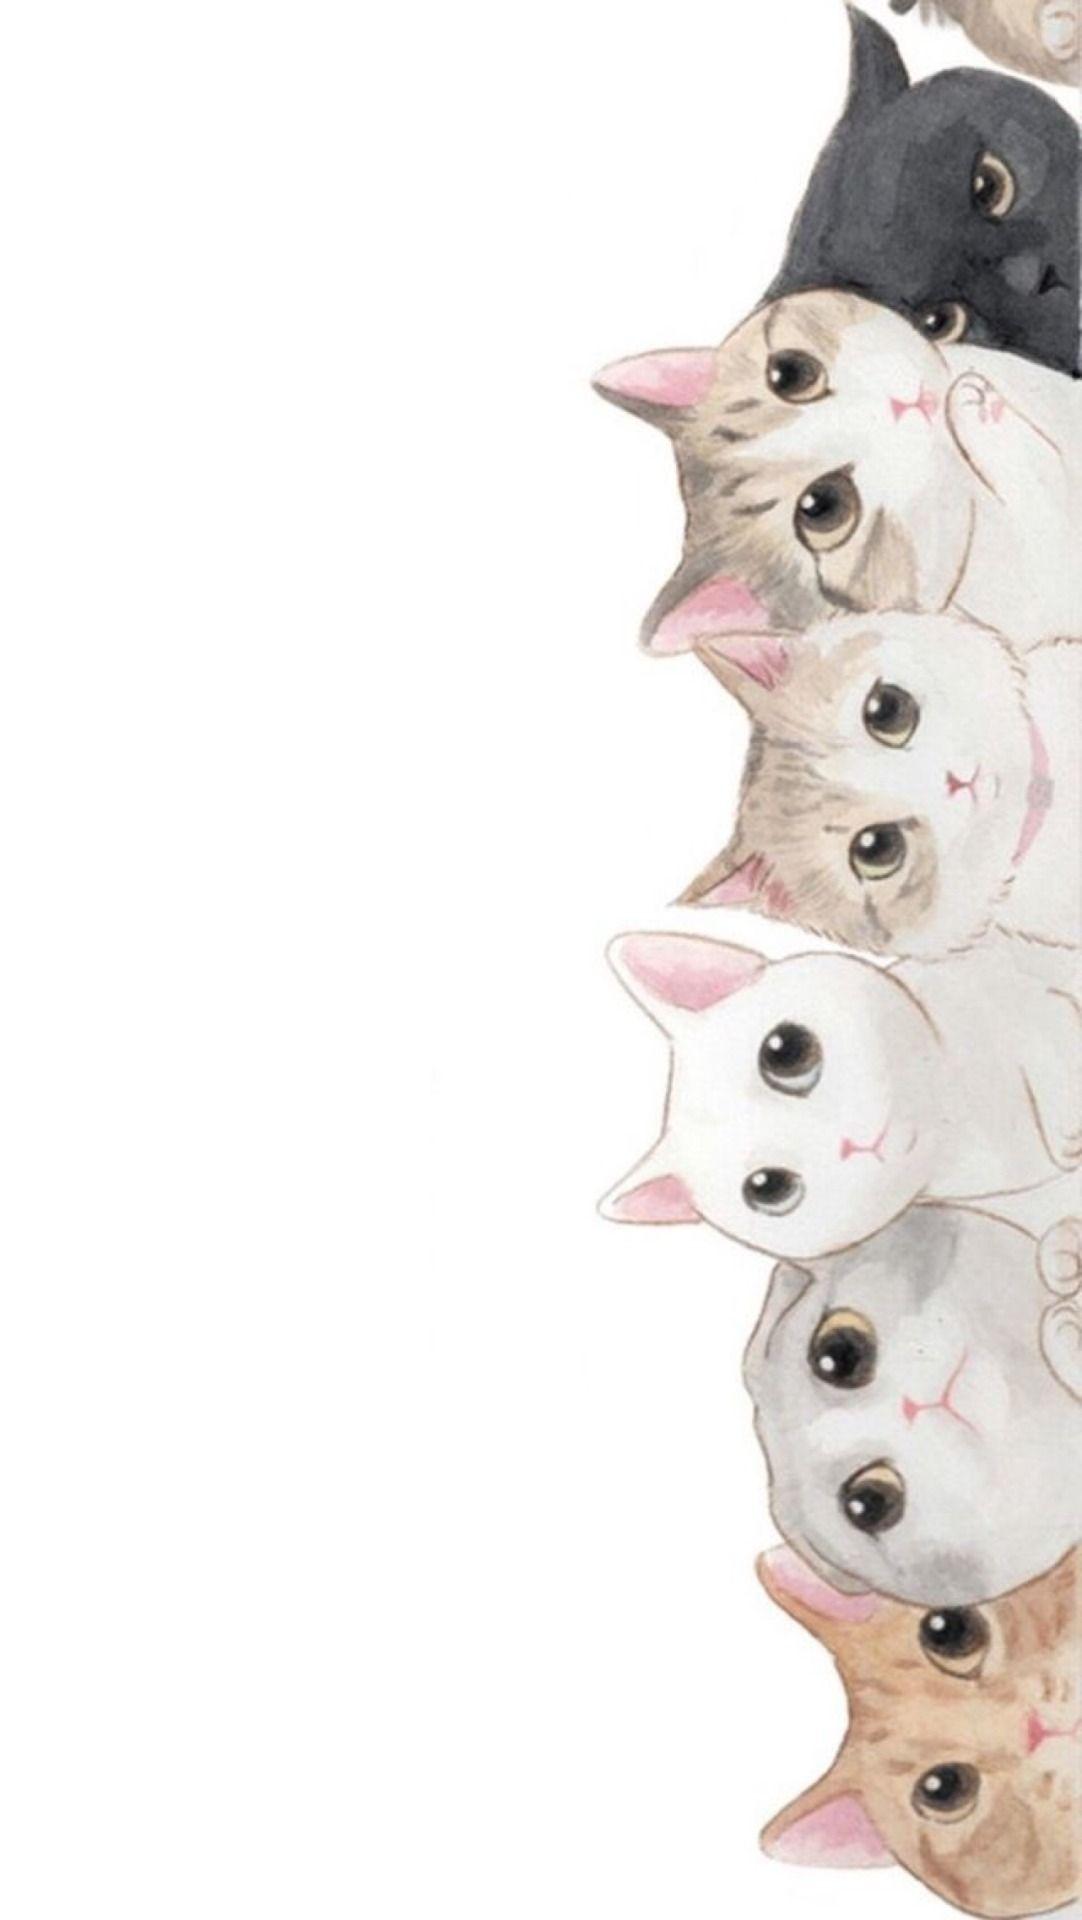 Pink Cat Wallpapers On Wallpaperdog